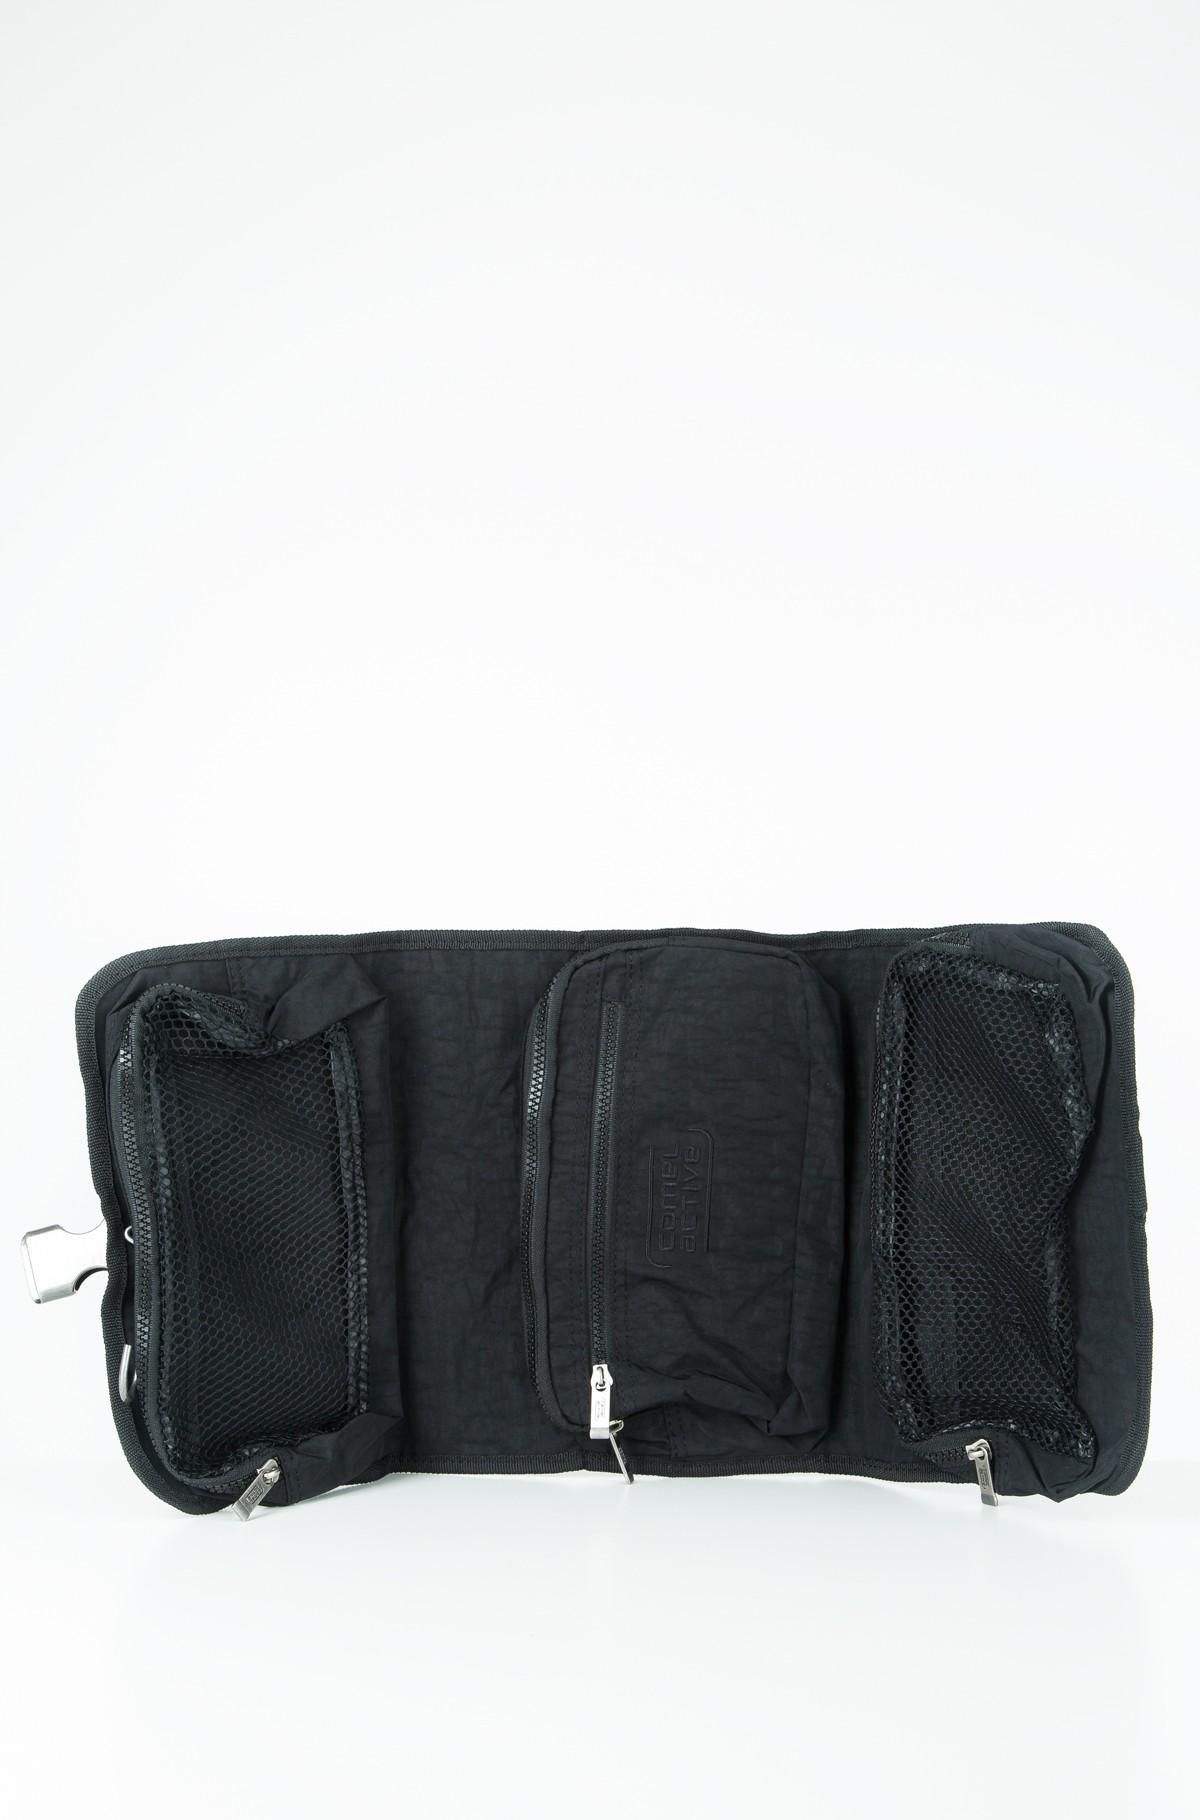 Hügieenitarvete kott B00/402-full-3